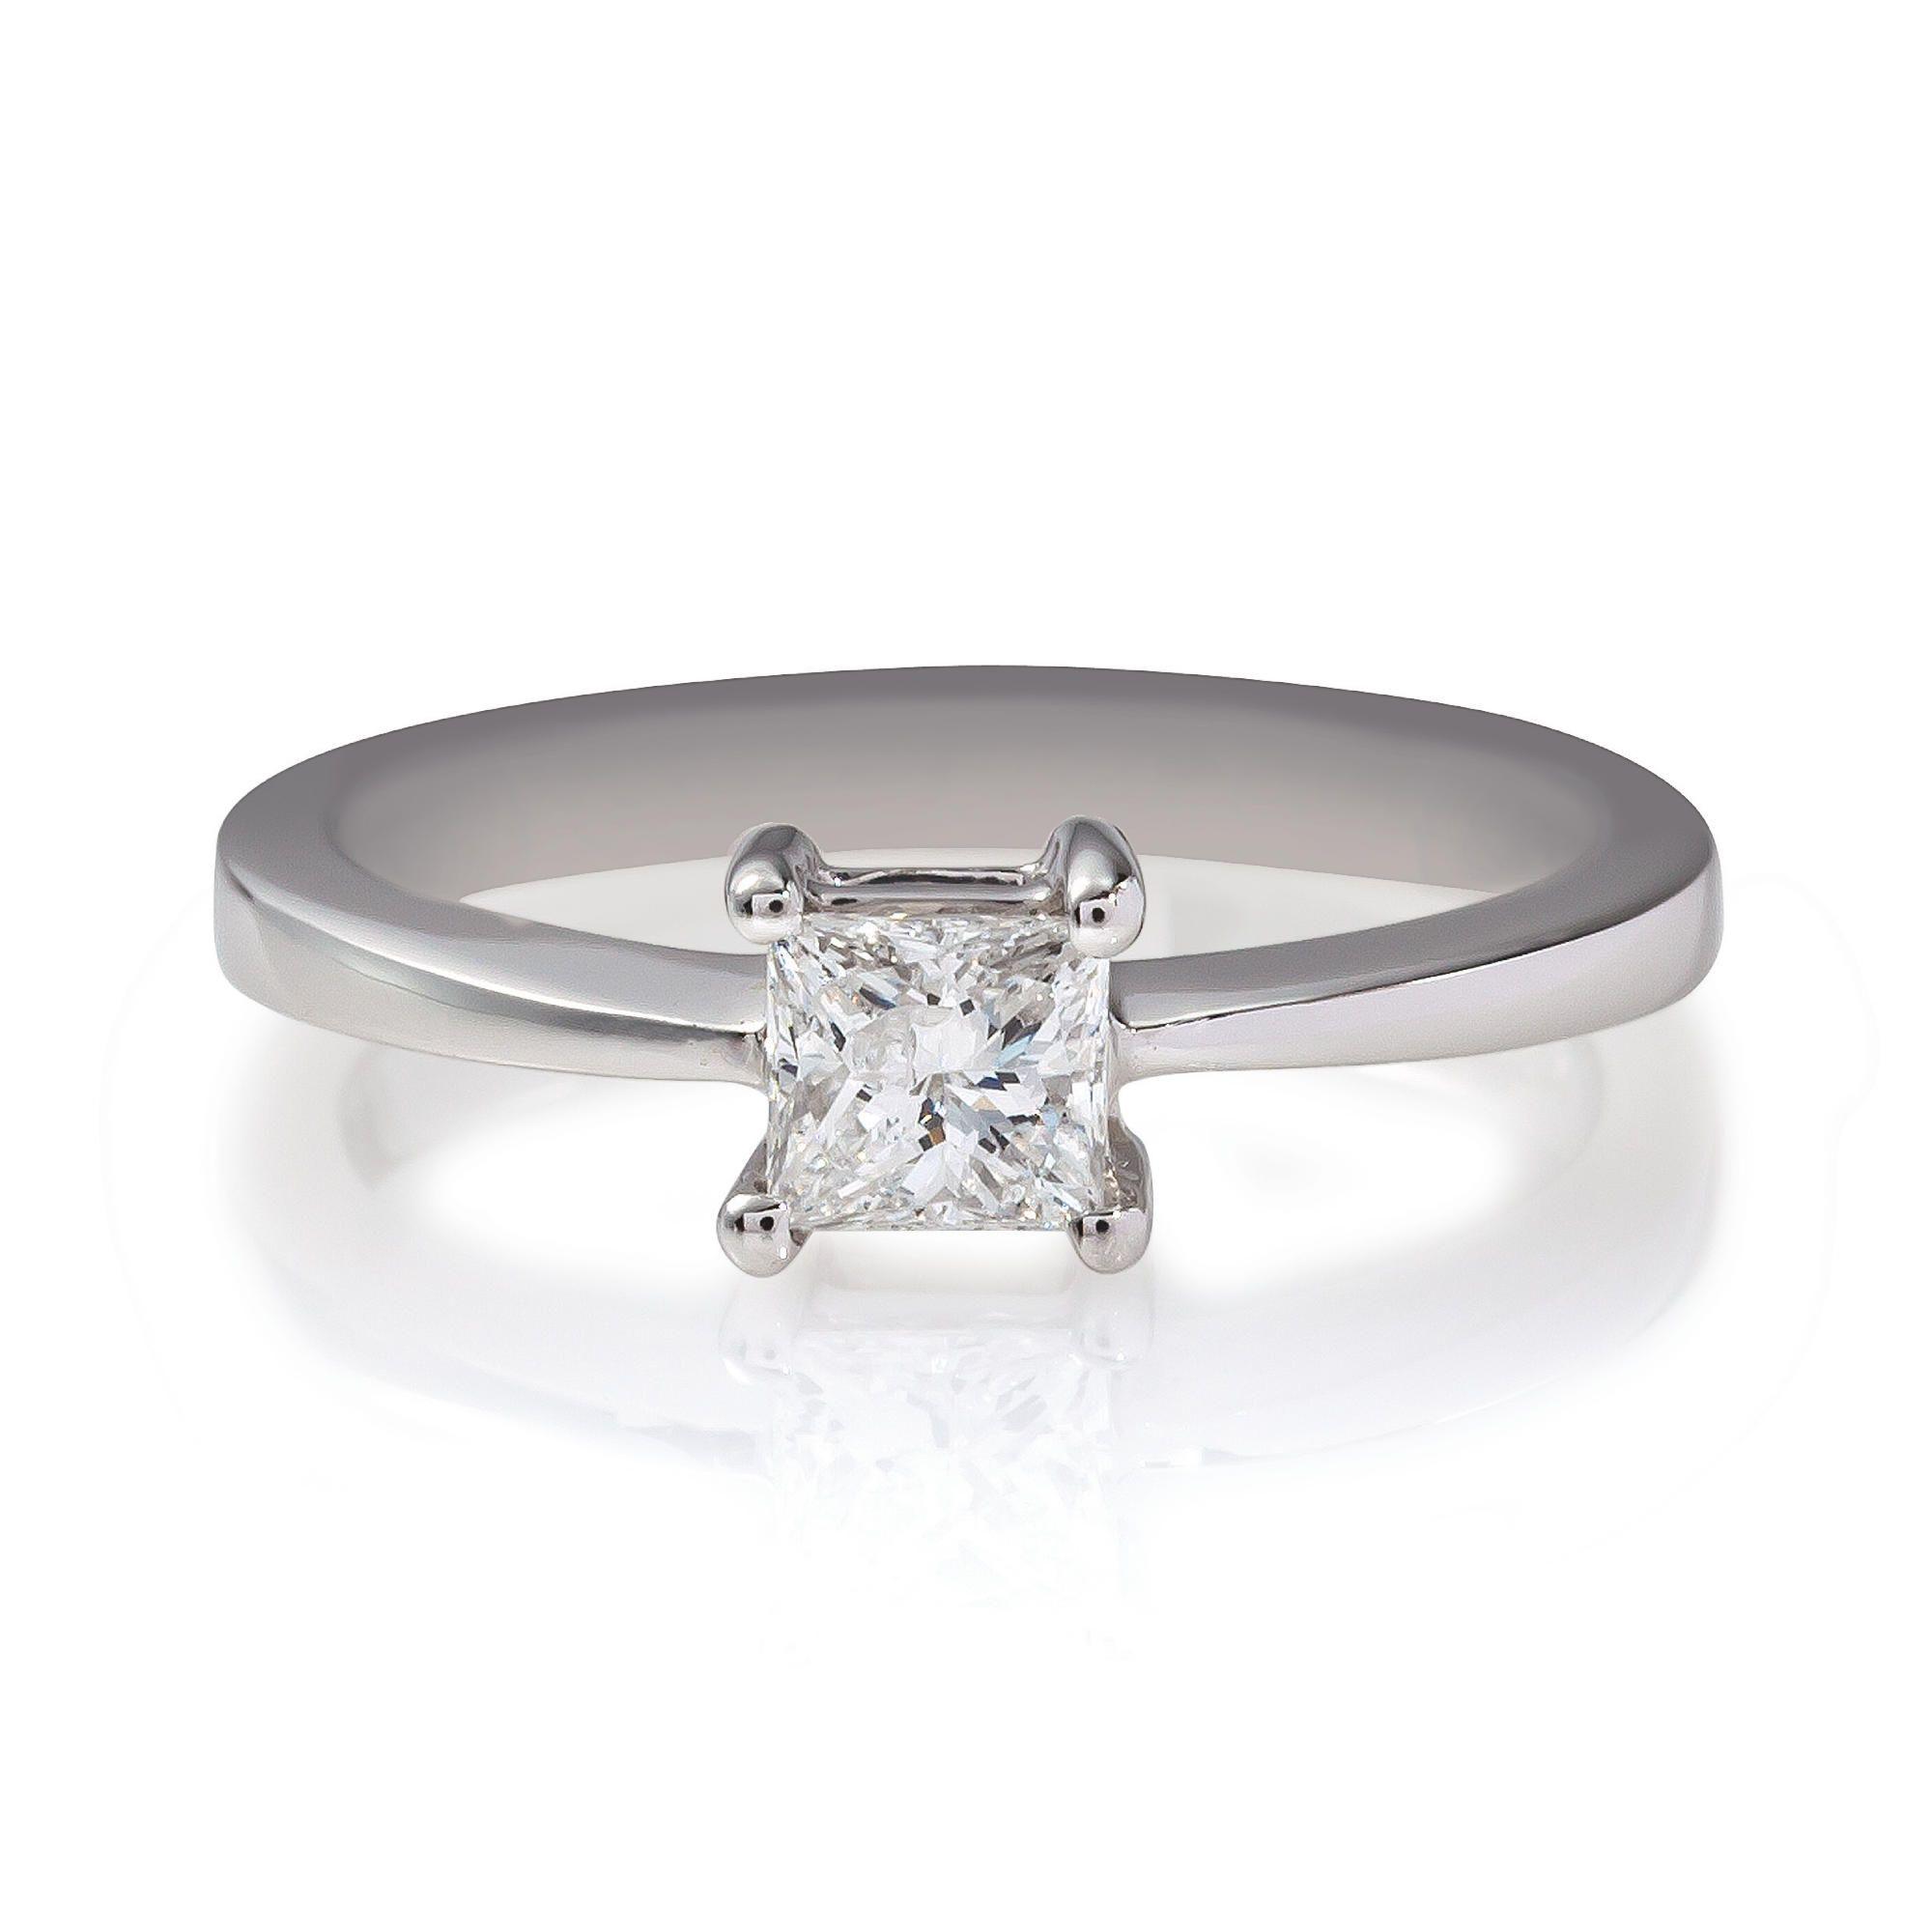 18ct White Gold 1/2ct Diamond Princess Cut Ring, N at Tesco Direct